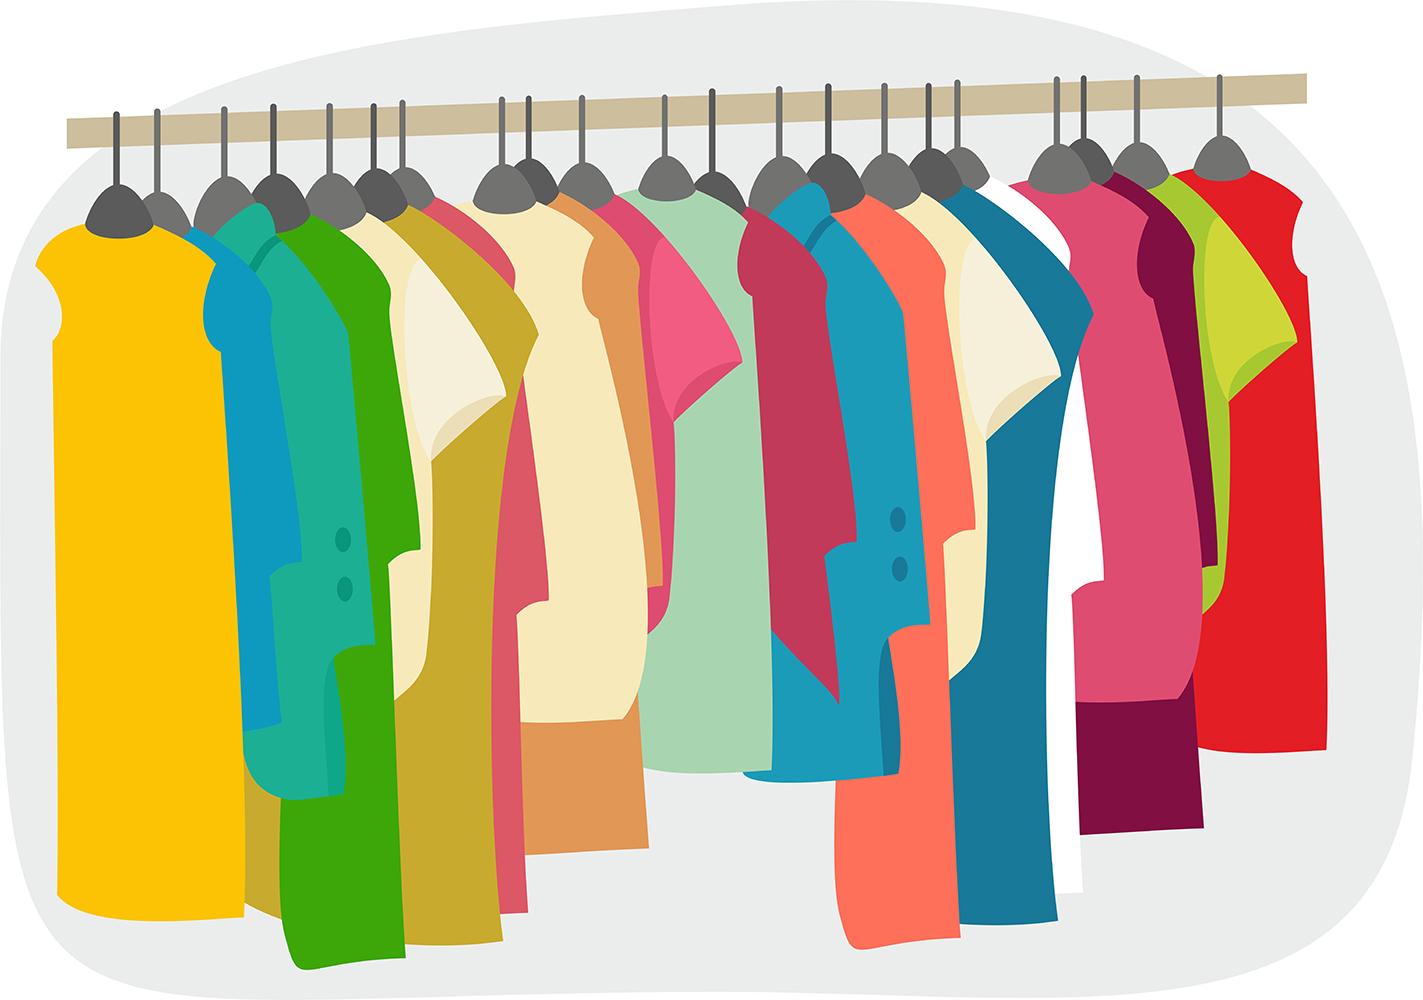 Linen Shirt For Men Are Turning Heads in Modern Street Wear